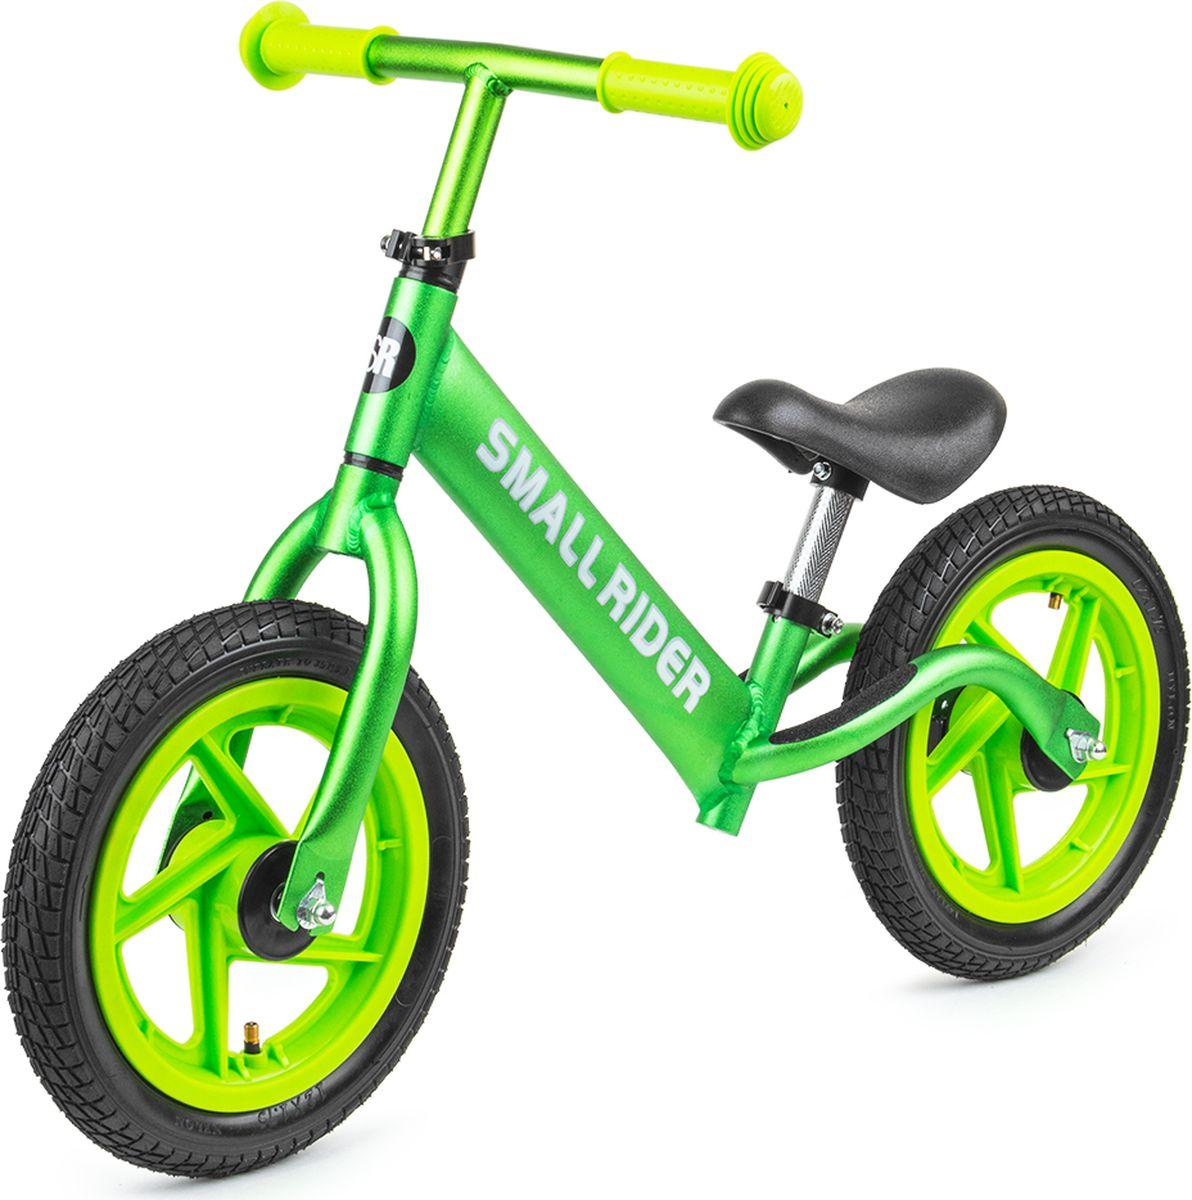 Small Rider Беговел Foot Racer Air цвет зеленый беговел dushi dushi беговел мотор